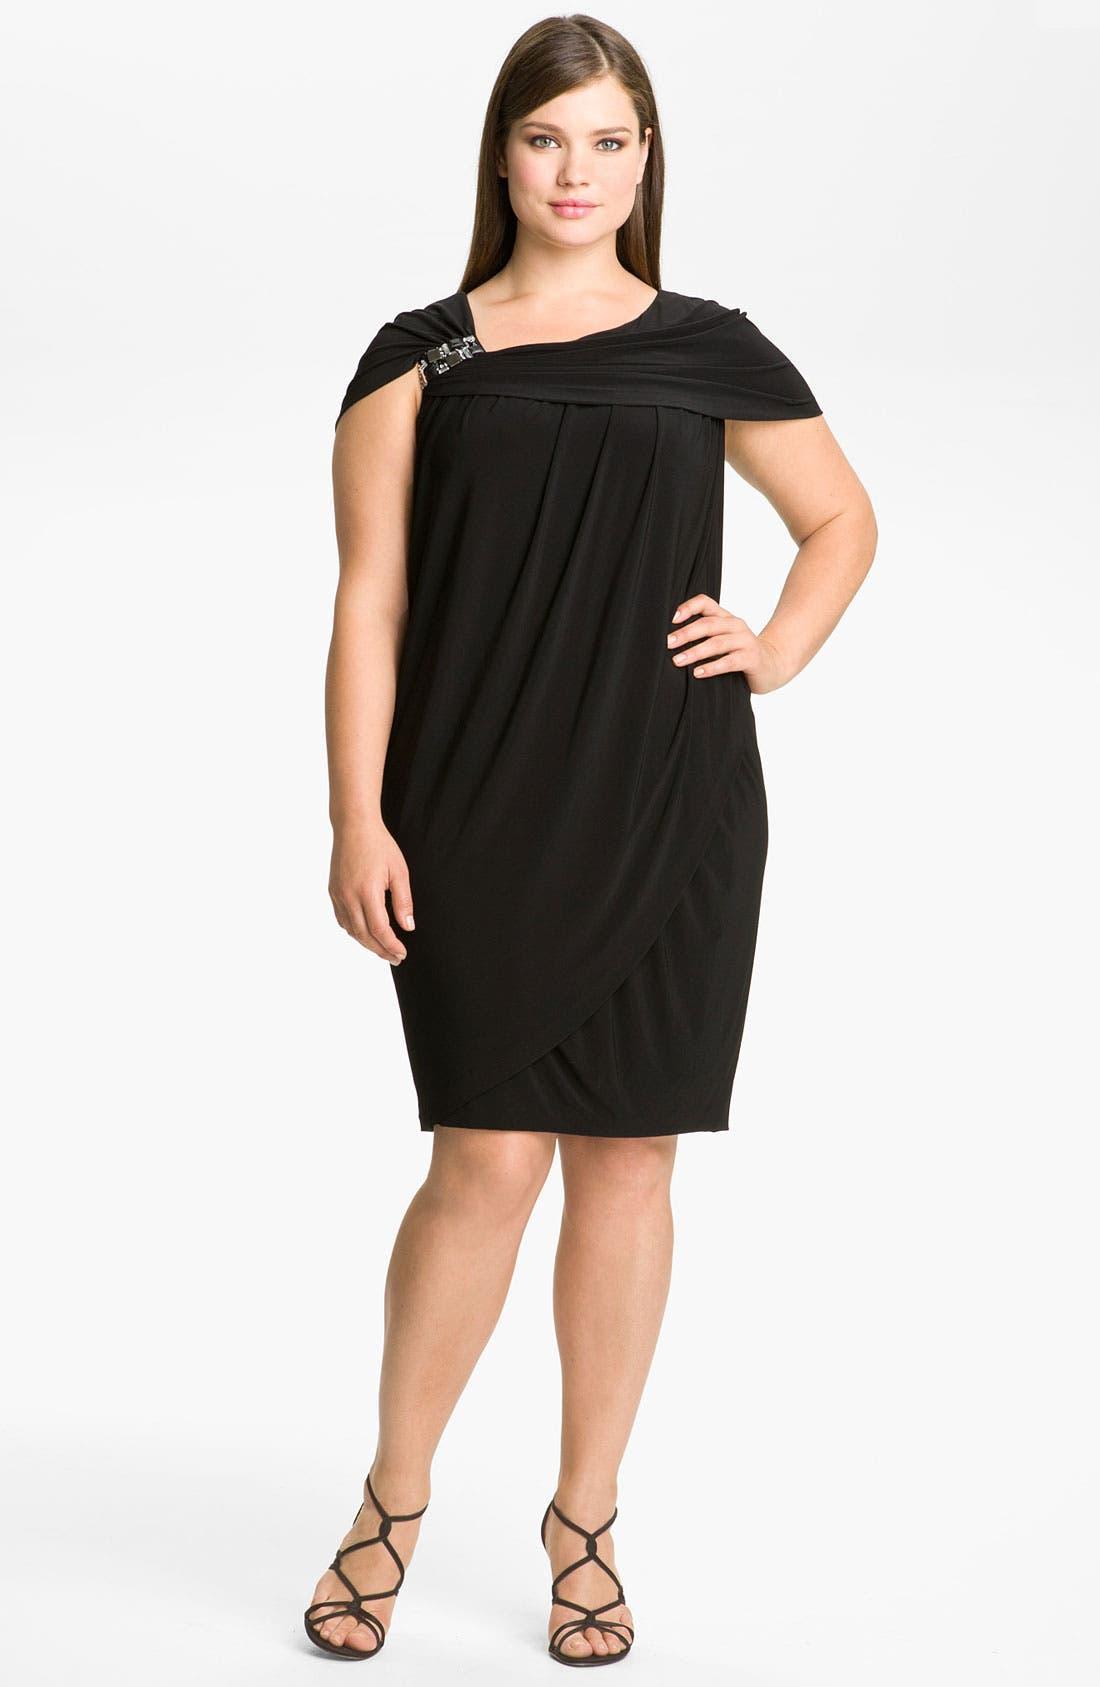 Alternate Image 1 Selected - Alex & Eve Beaded Jersey Dress (Plus Size)